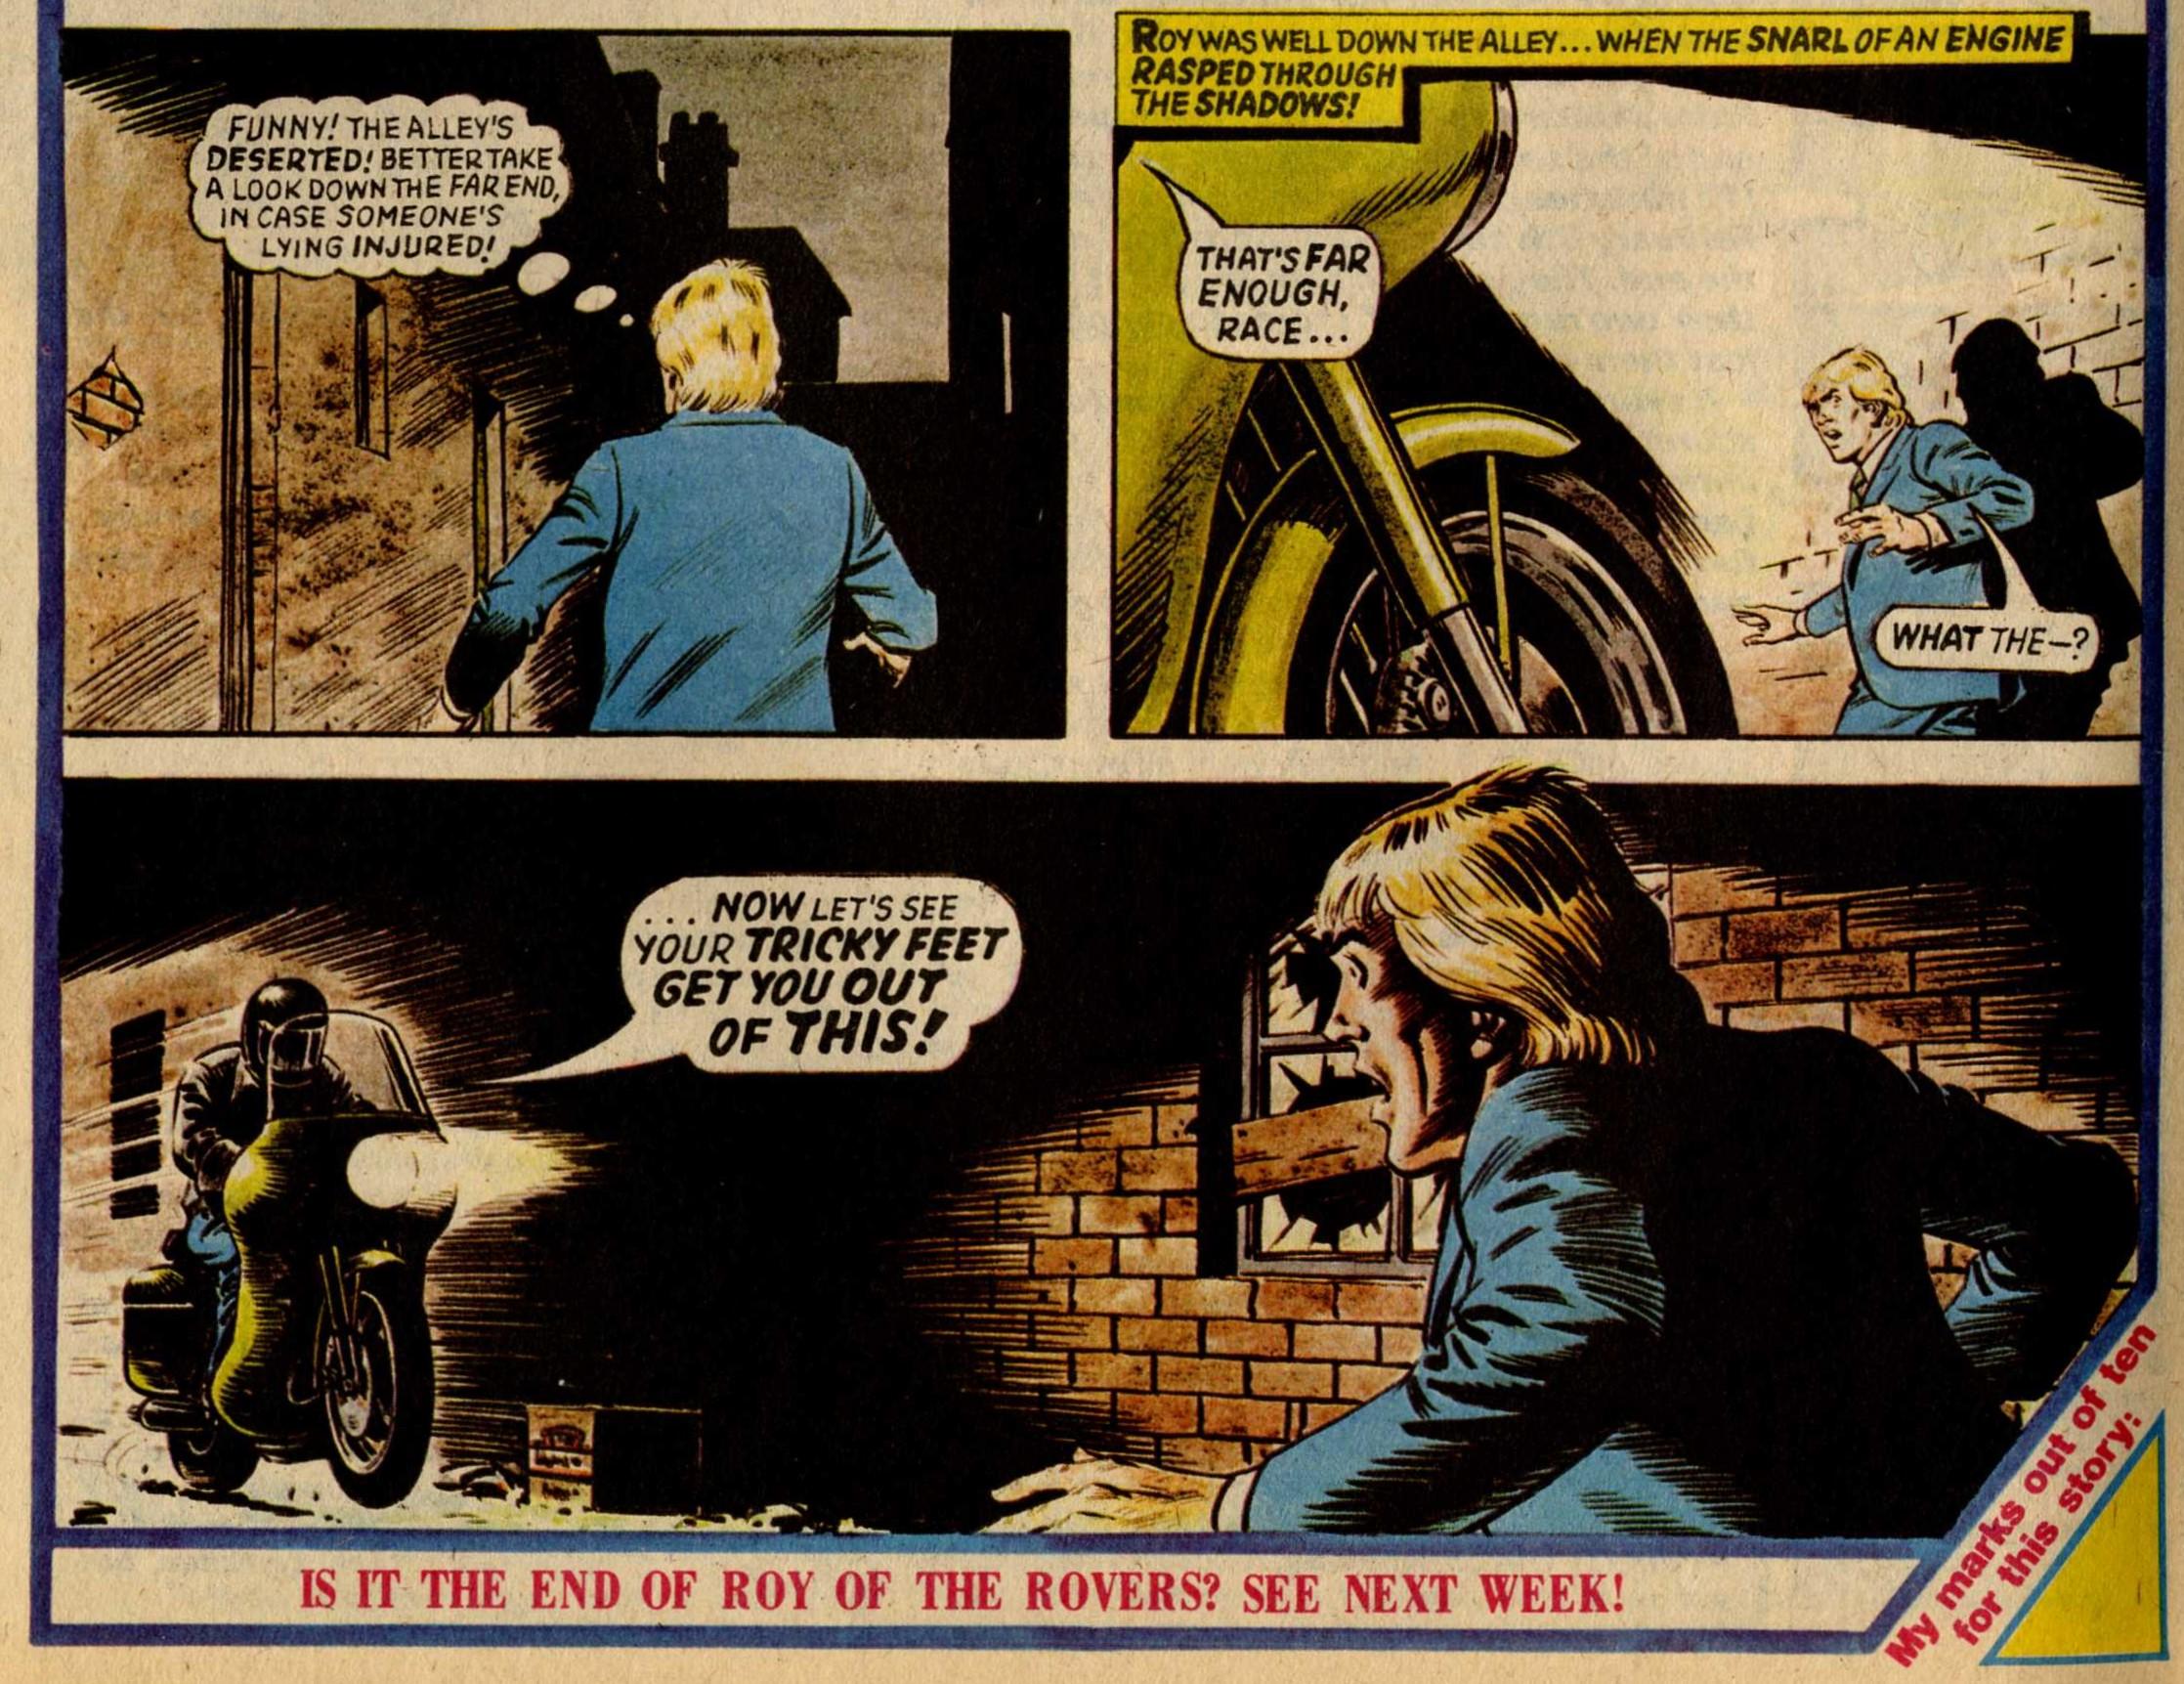 Elton Blake (on the bike), drawn by David Sque